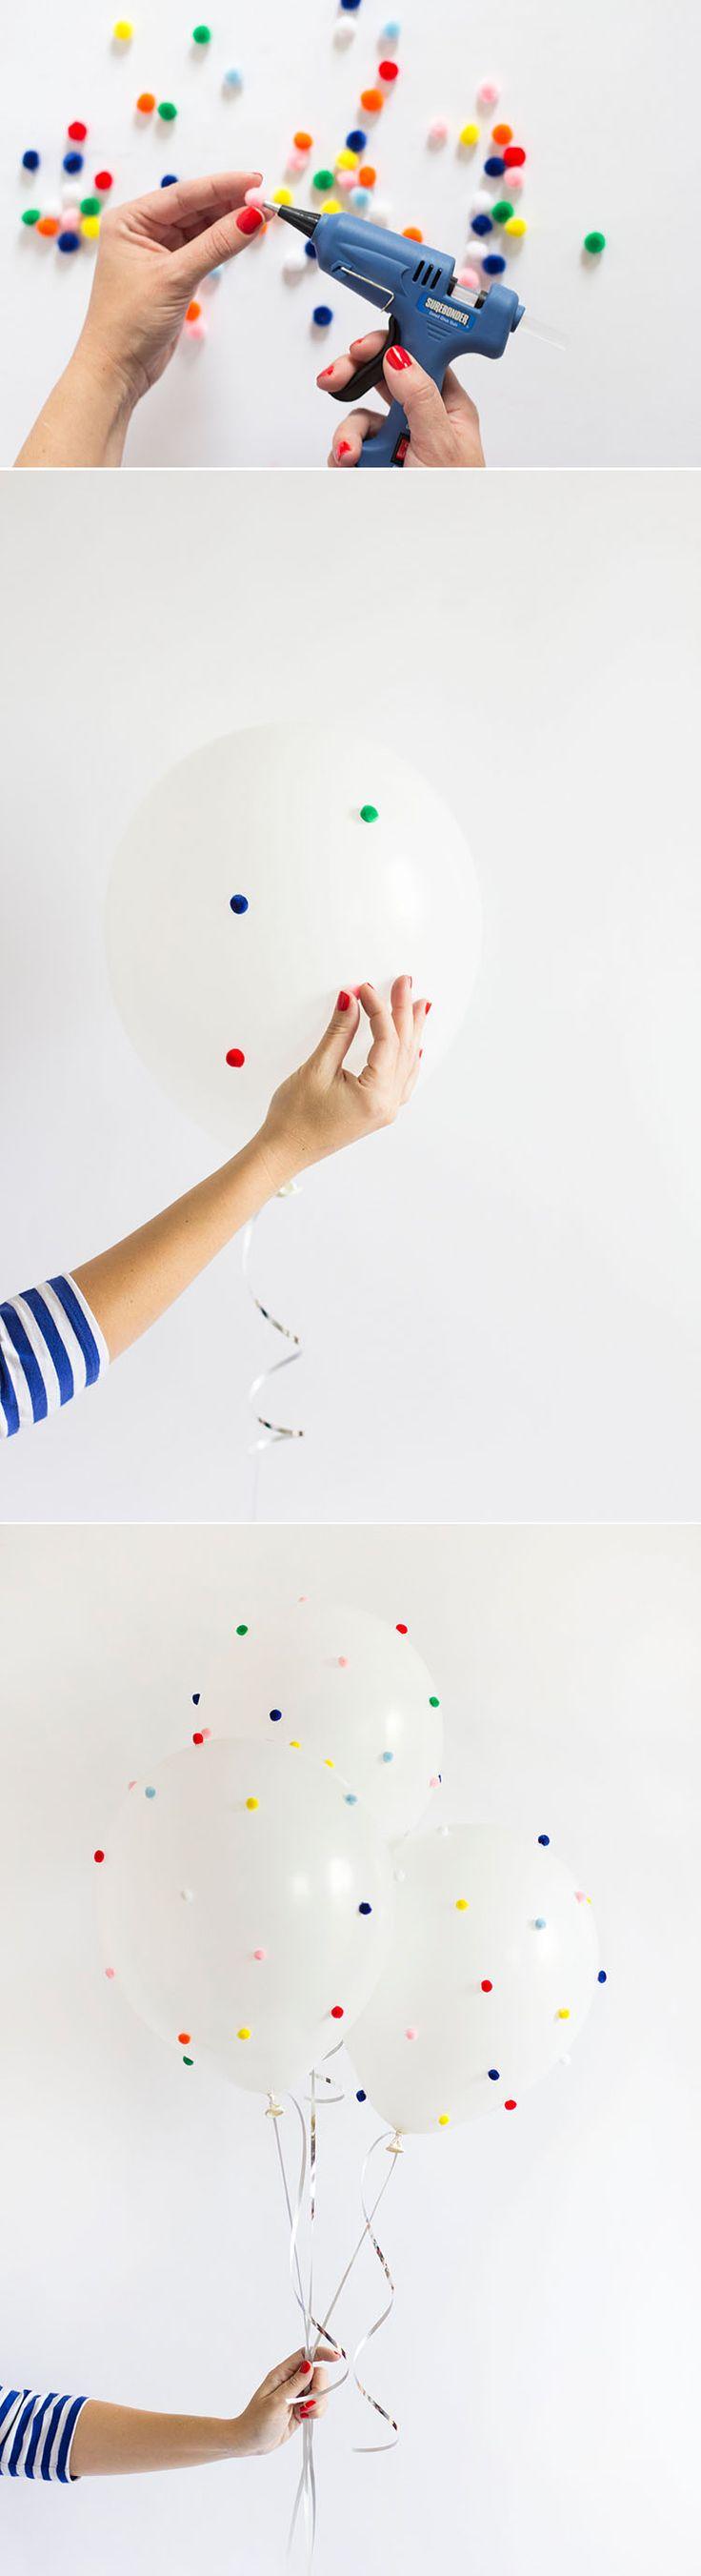 How to make DIY Pom Pom Balloons